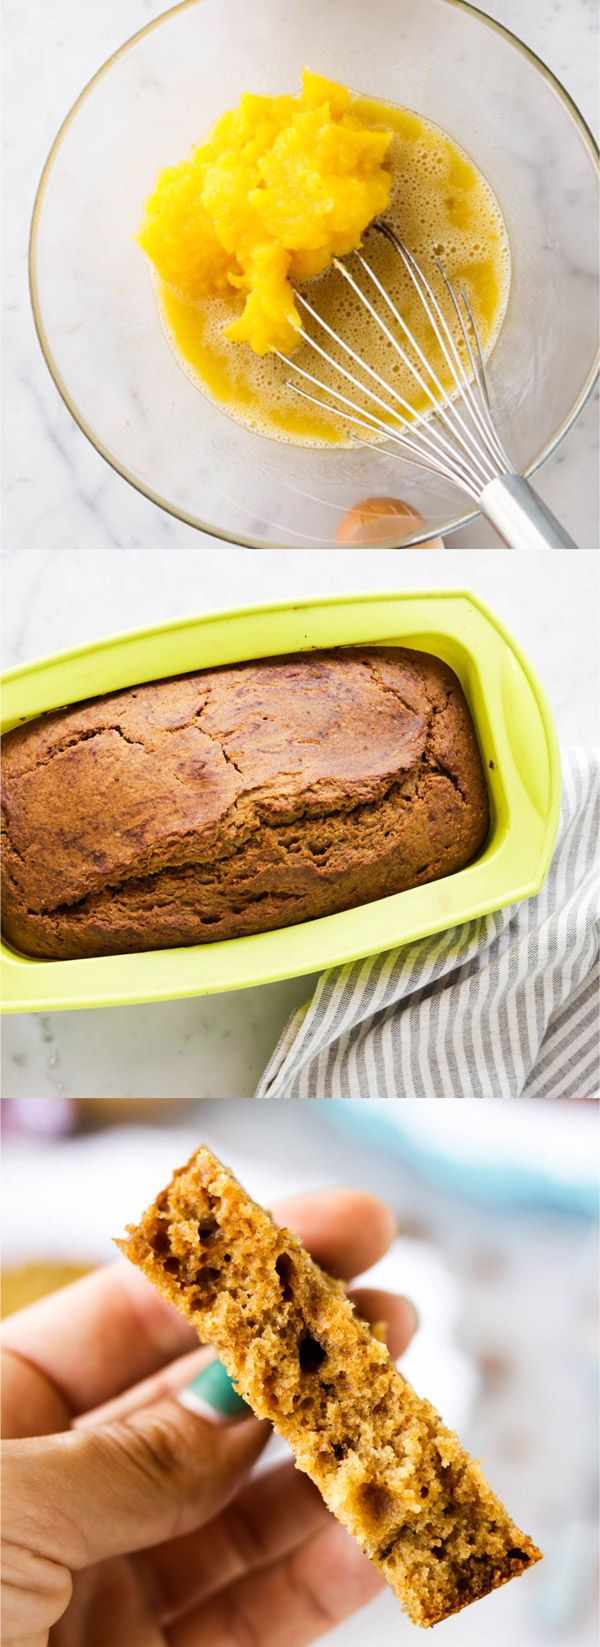 Полезный тыквенный хлеб (кекс)!! http://fullspoon.ru/poleznyj-tykvennyj-hleb-keks/